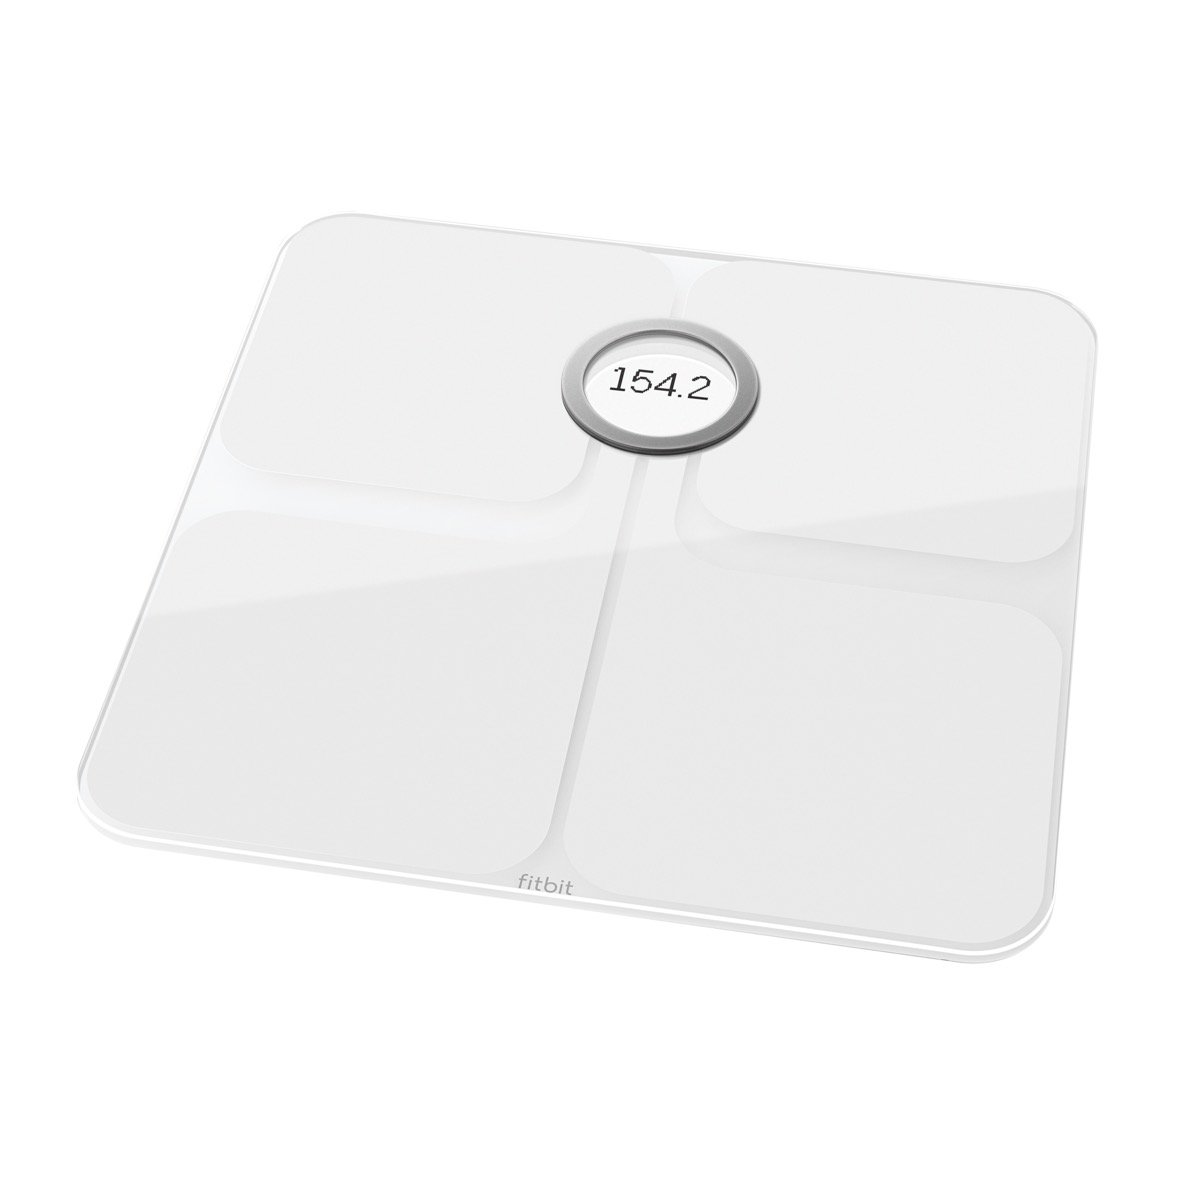 Fitbit Aria 2, White